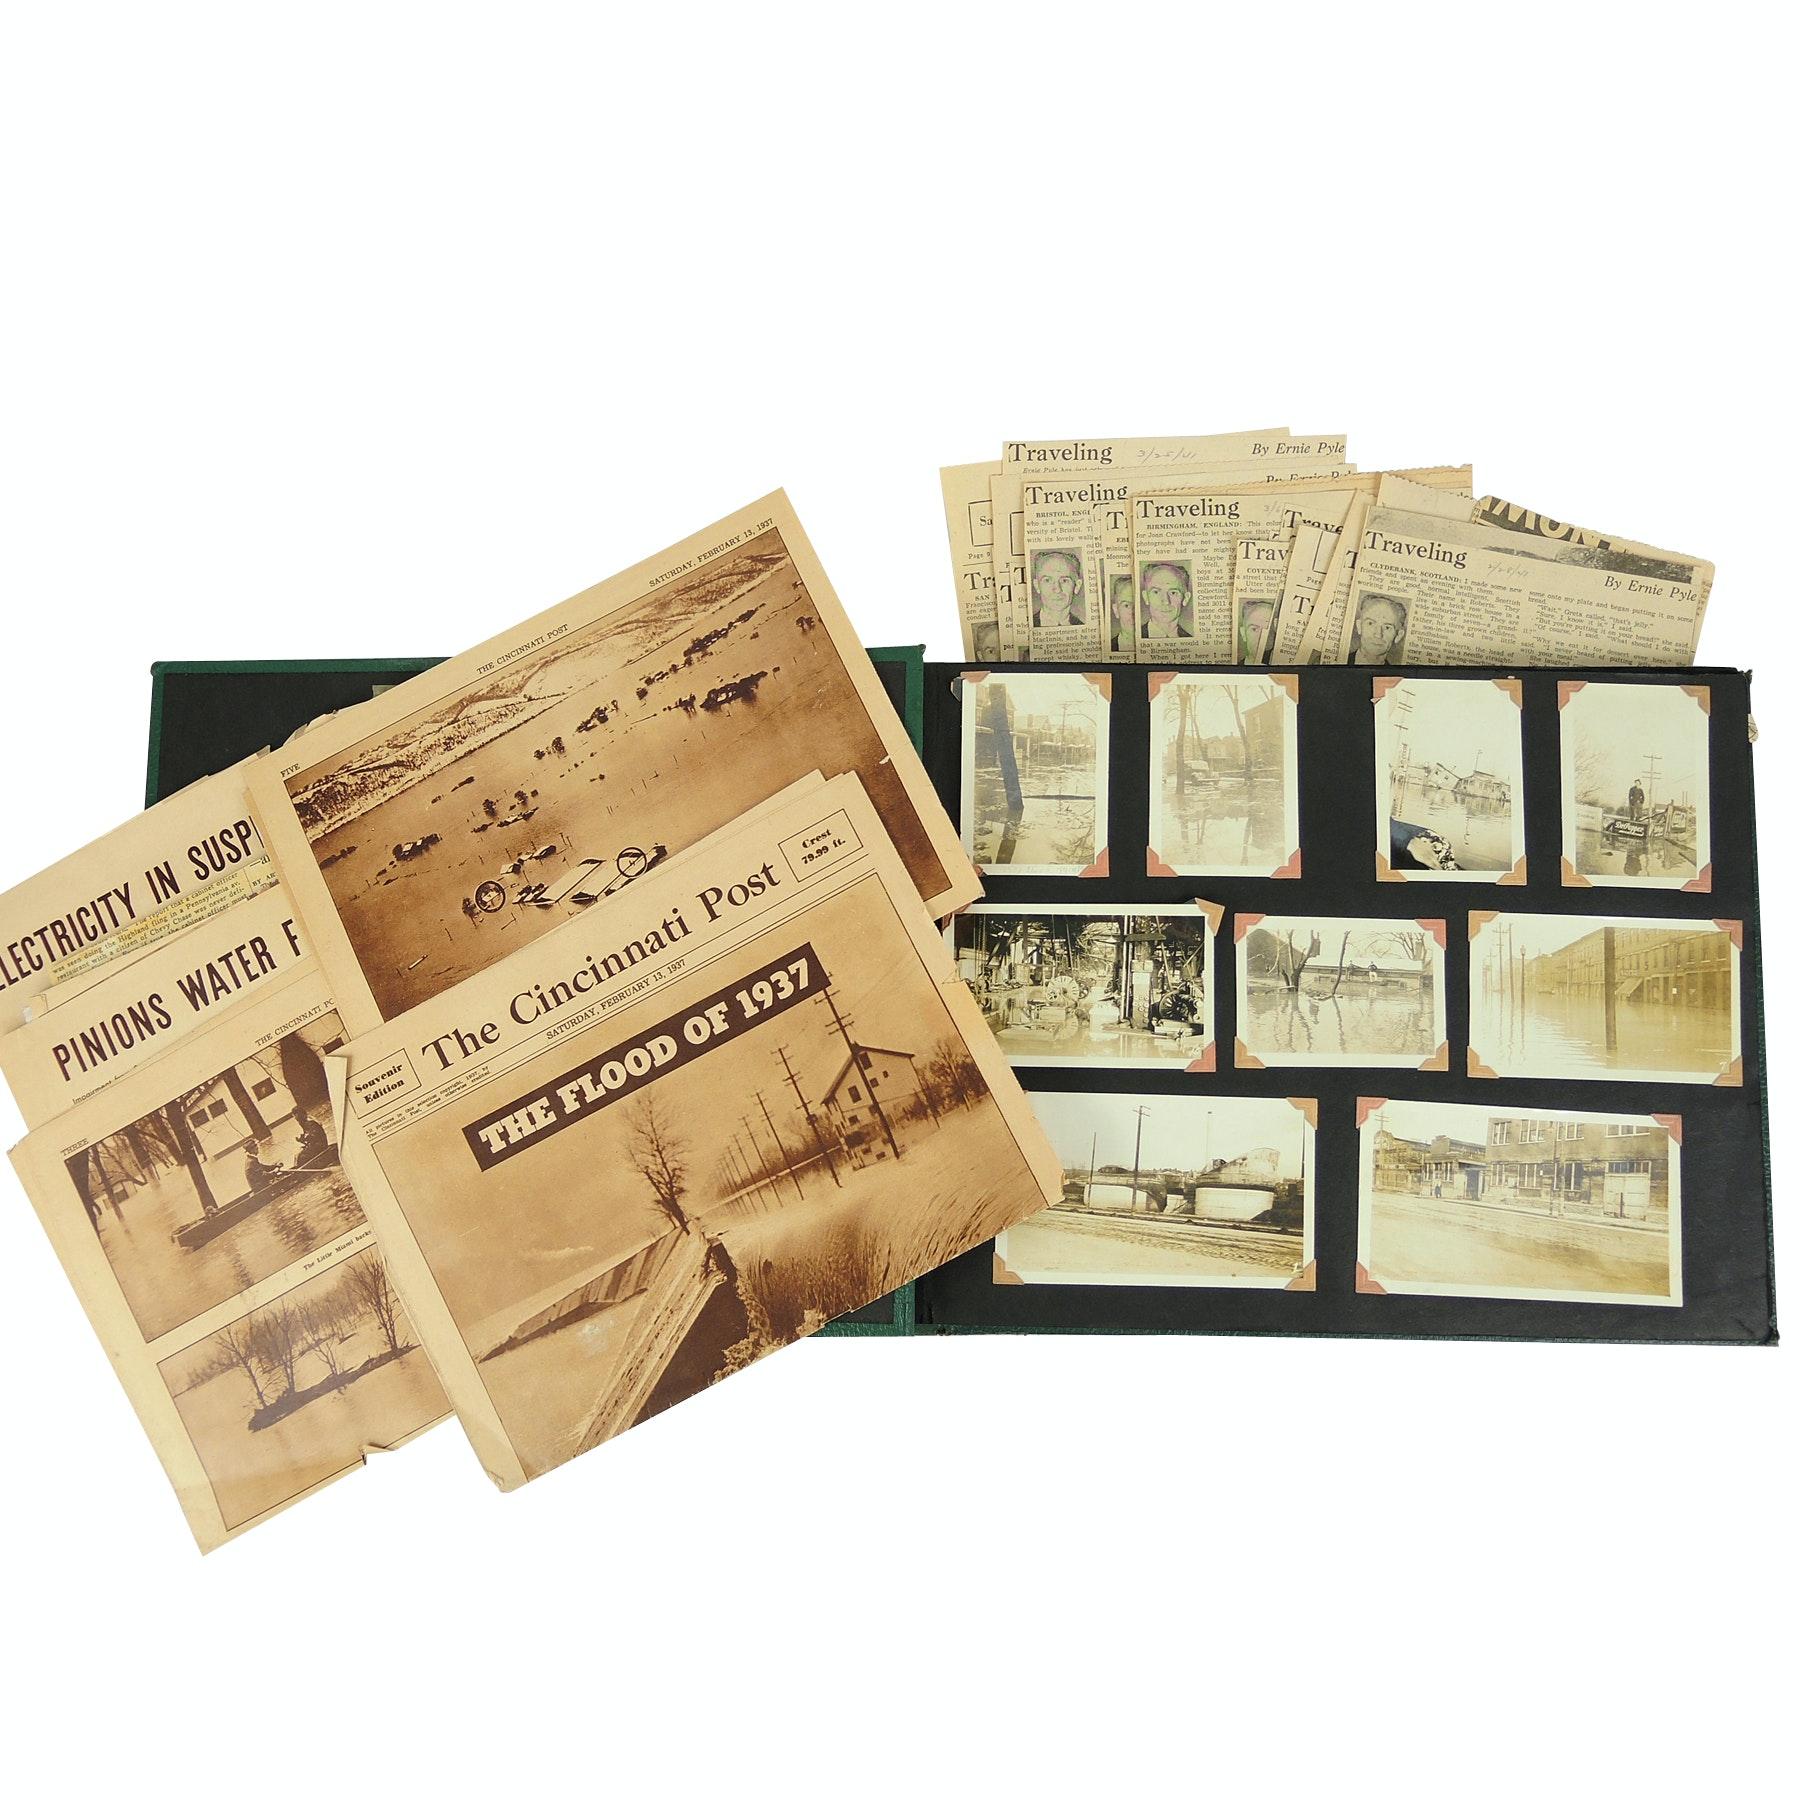 1937 Cincinnati Flood Ephemera and Ernie Pyle News Paper Clippings